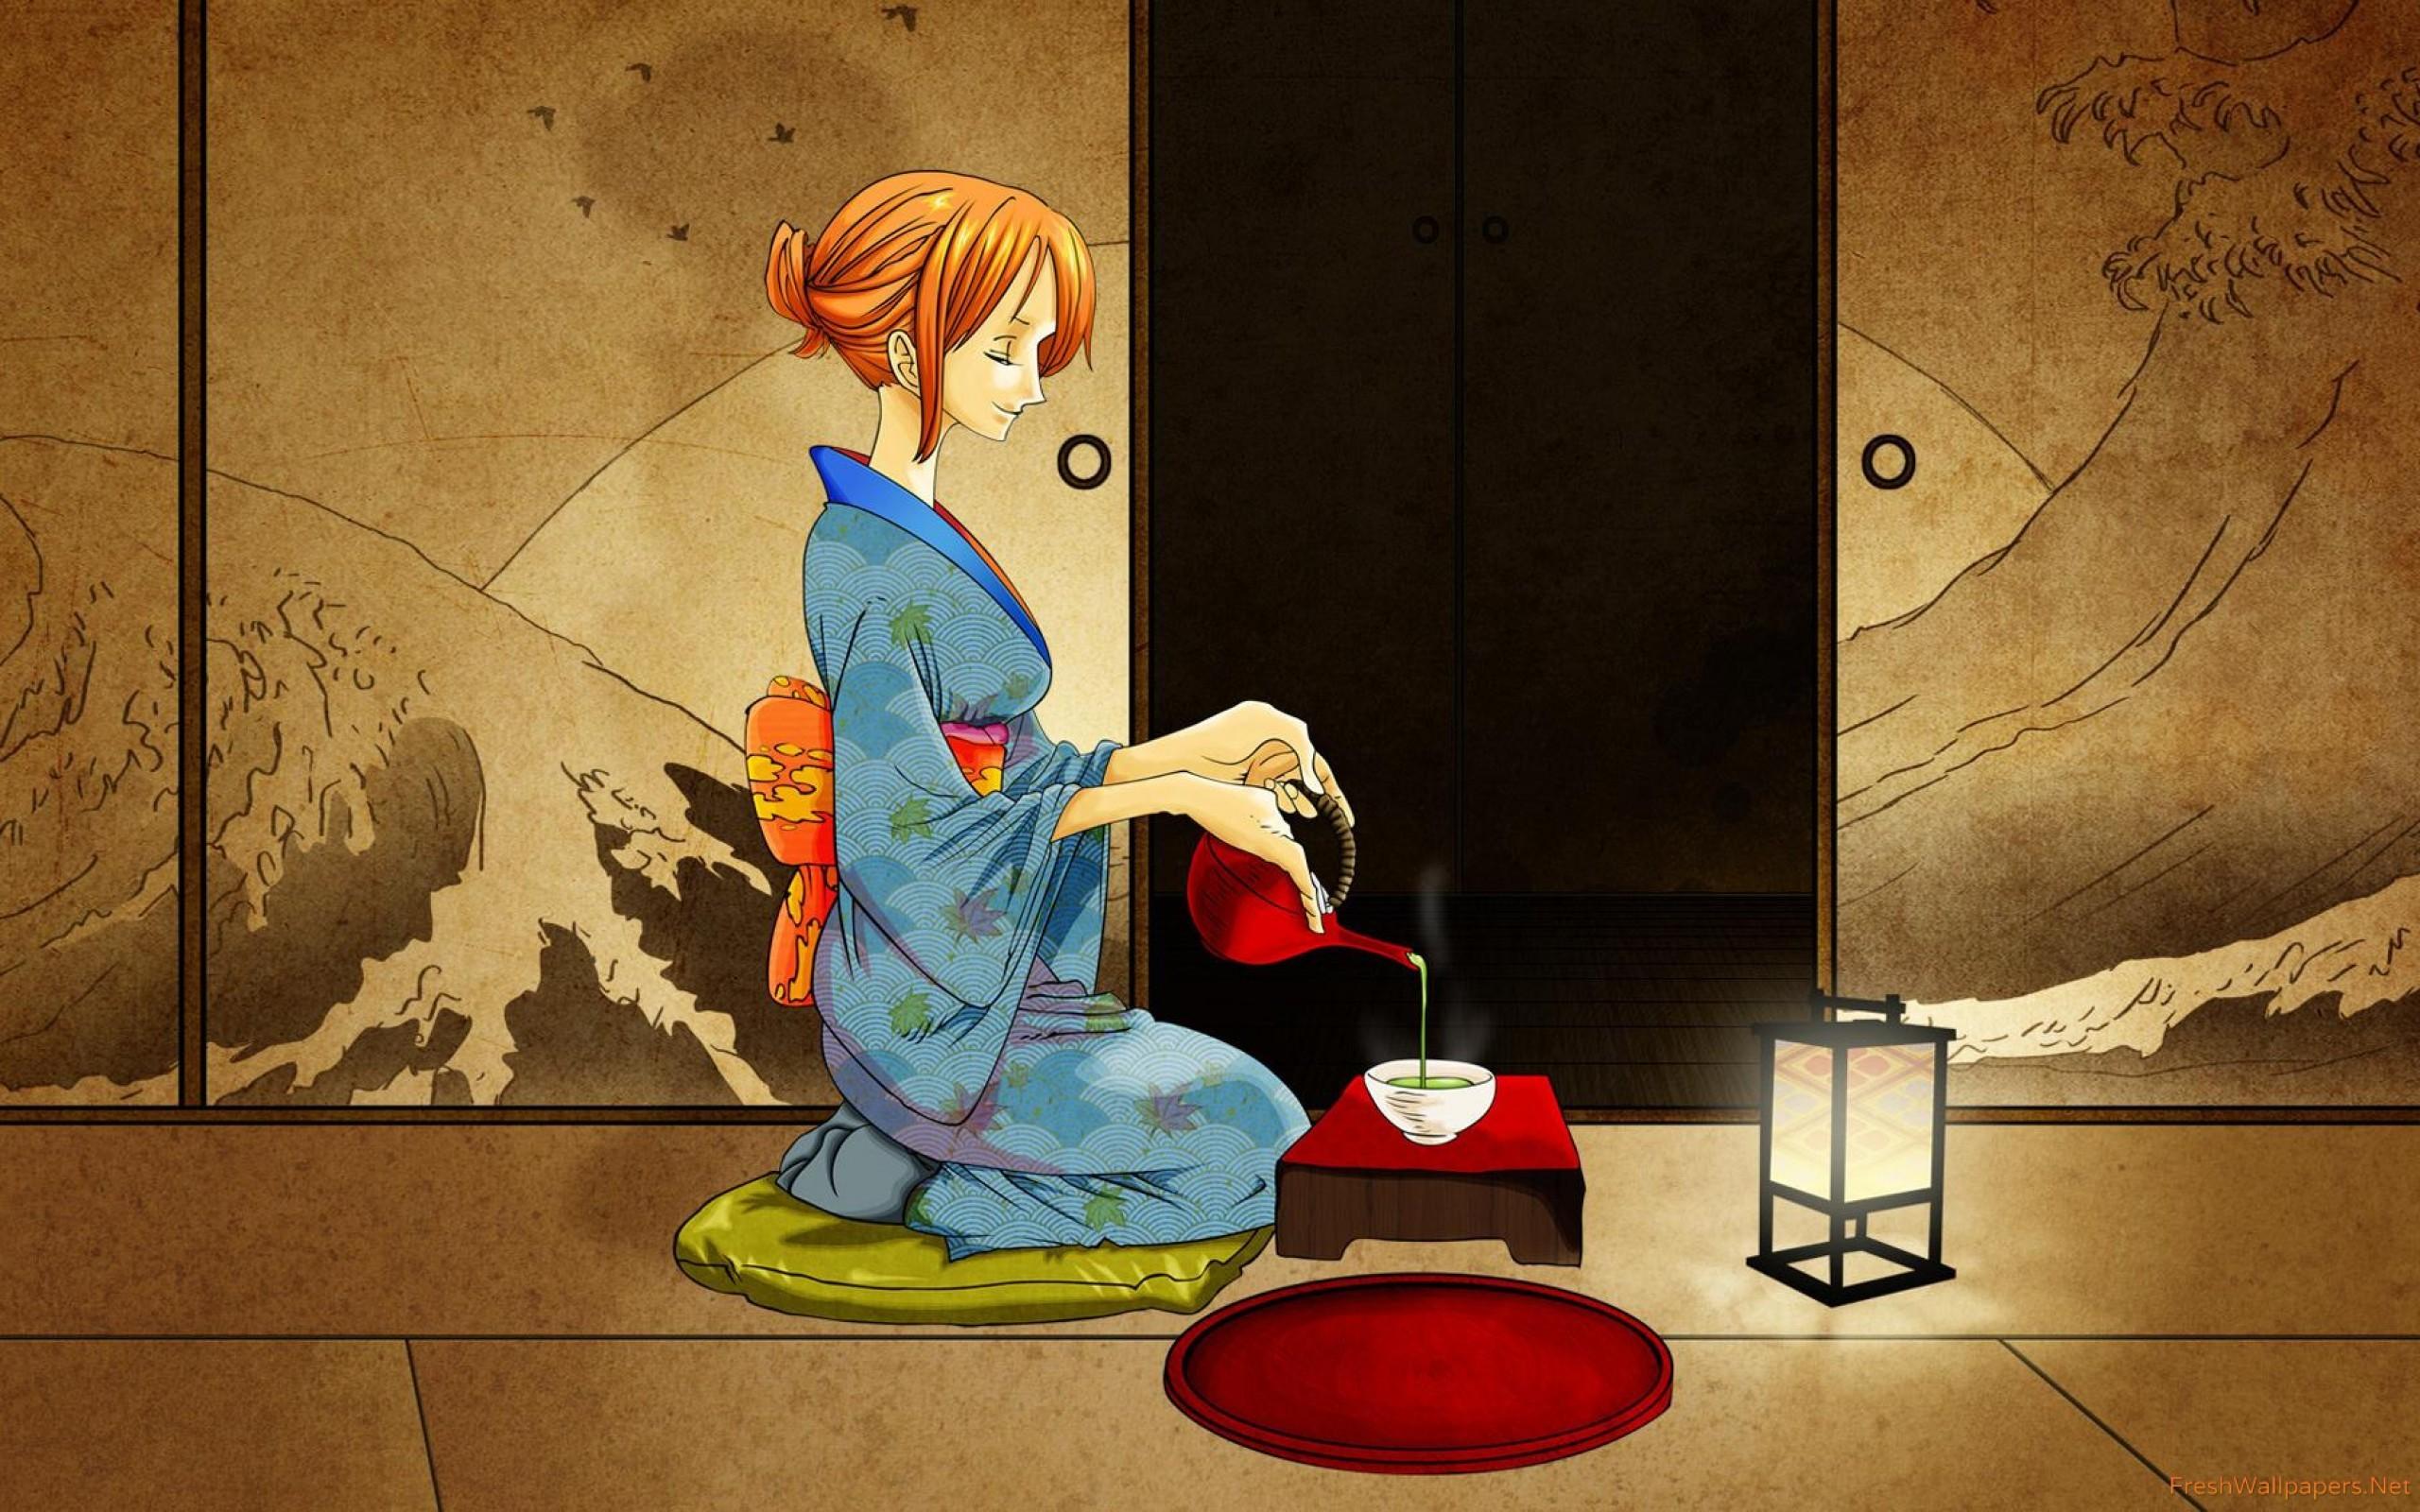 Res: 2560x1600, Nami - One Piece wallpaper